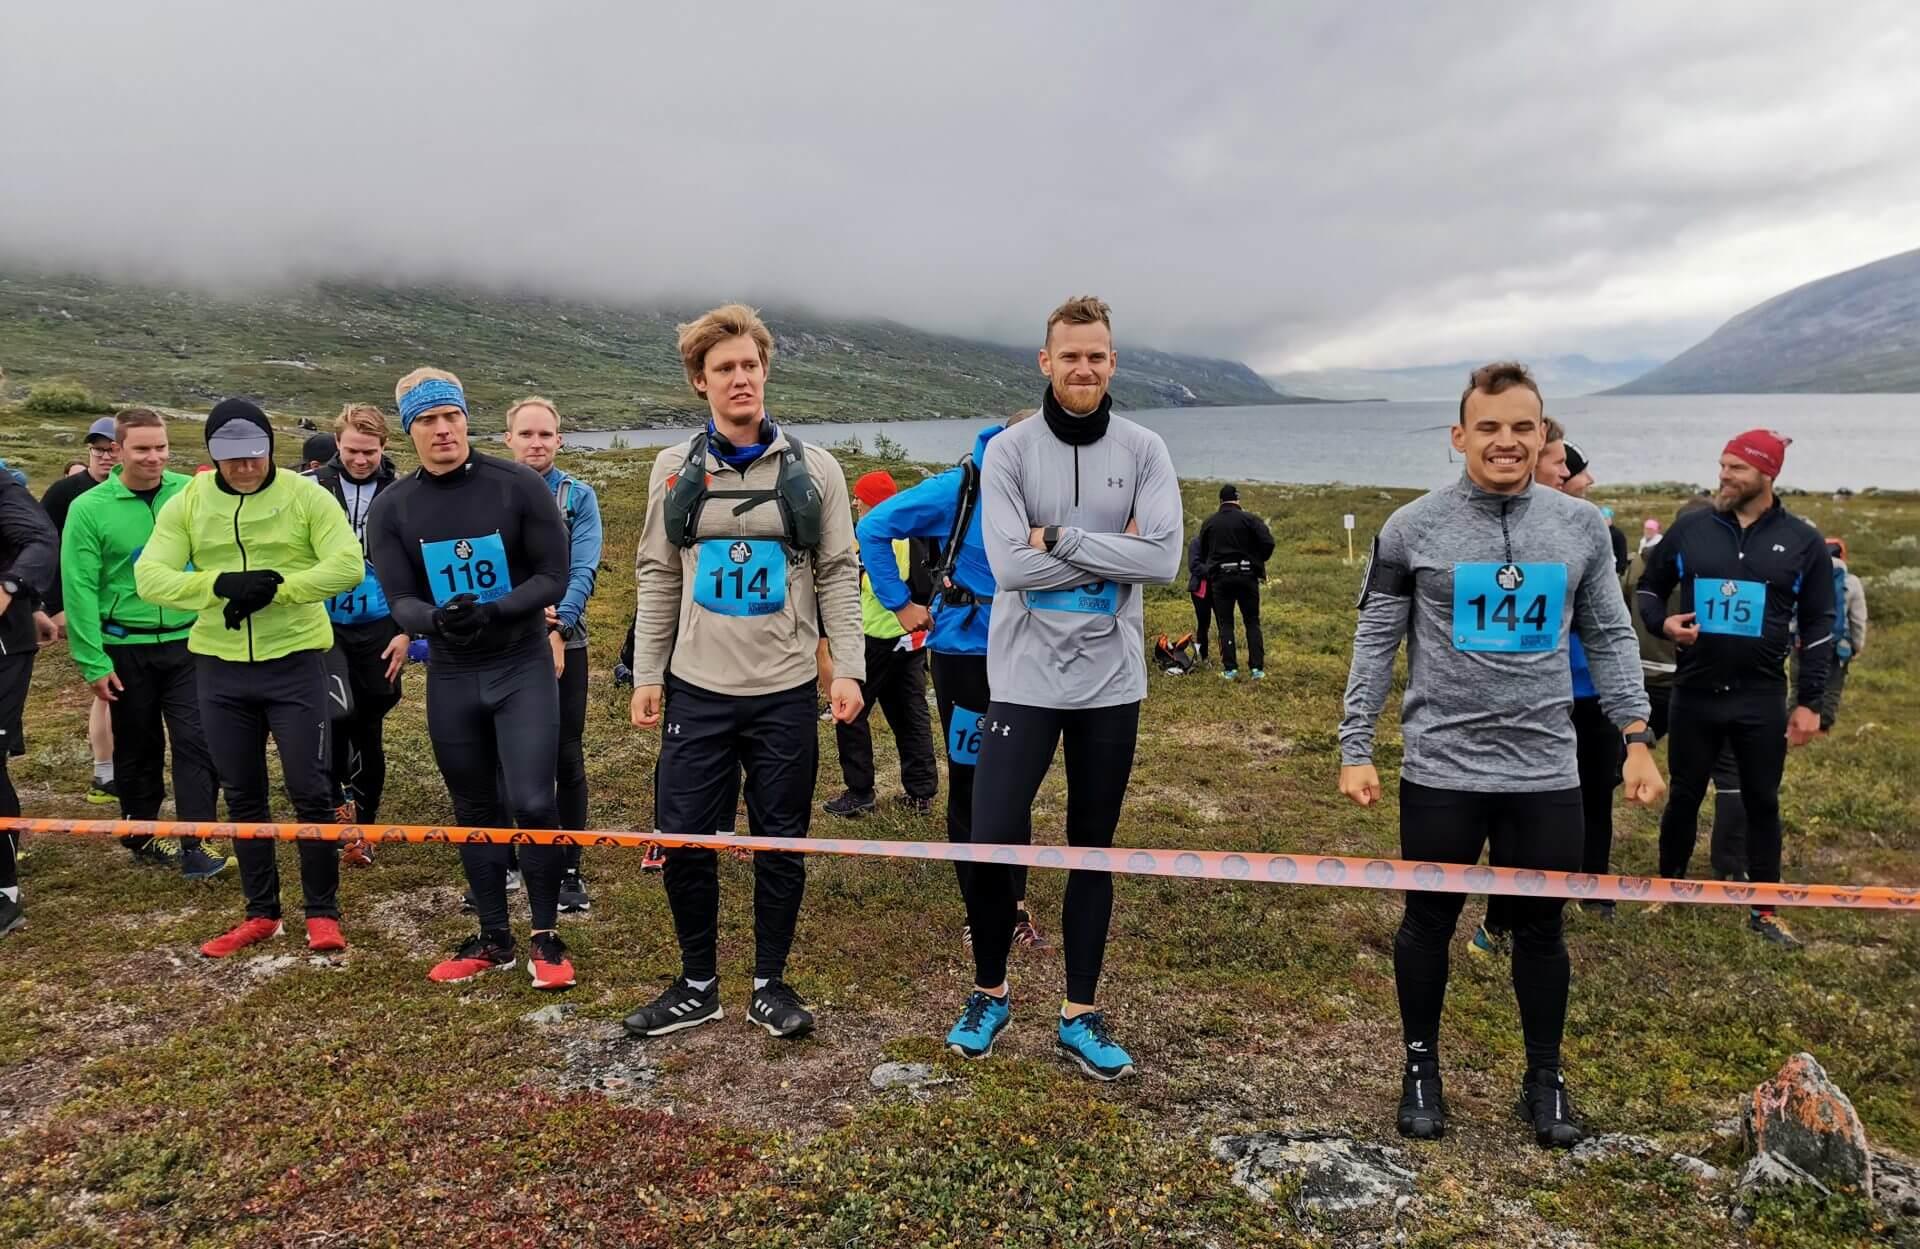 Arctic Circle Race 2019 Polcirkelloppet Guijaure start 144 114 118